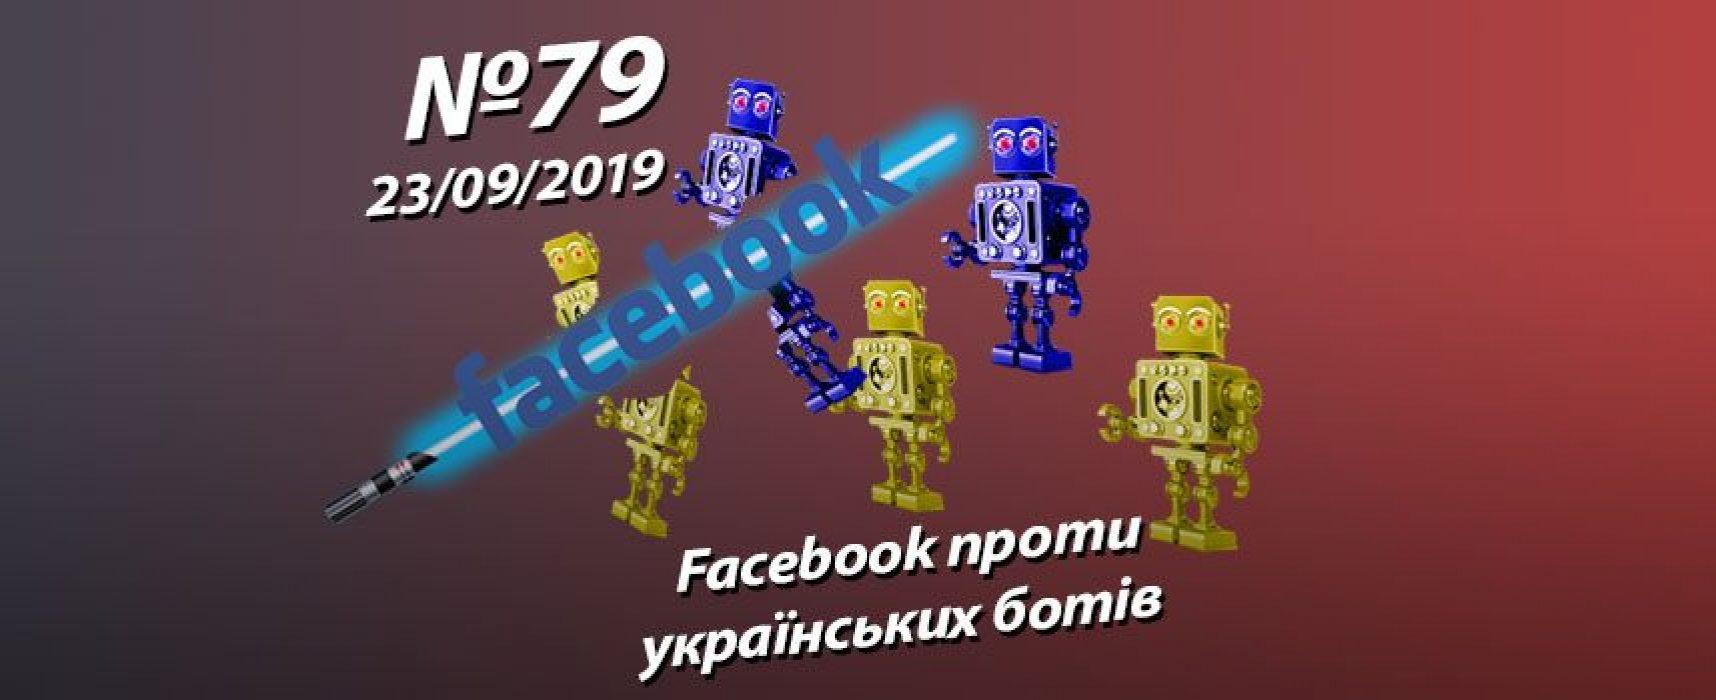 Facebook проти українських ботів – StopFake.org